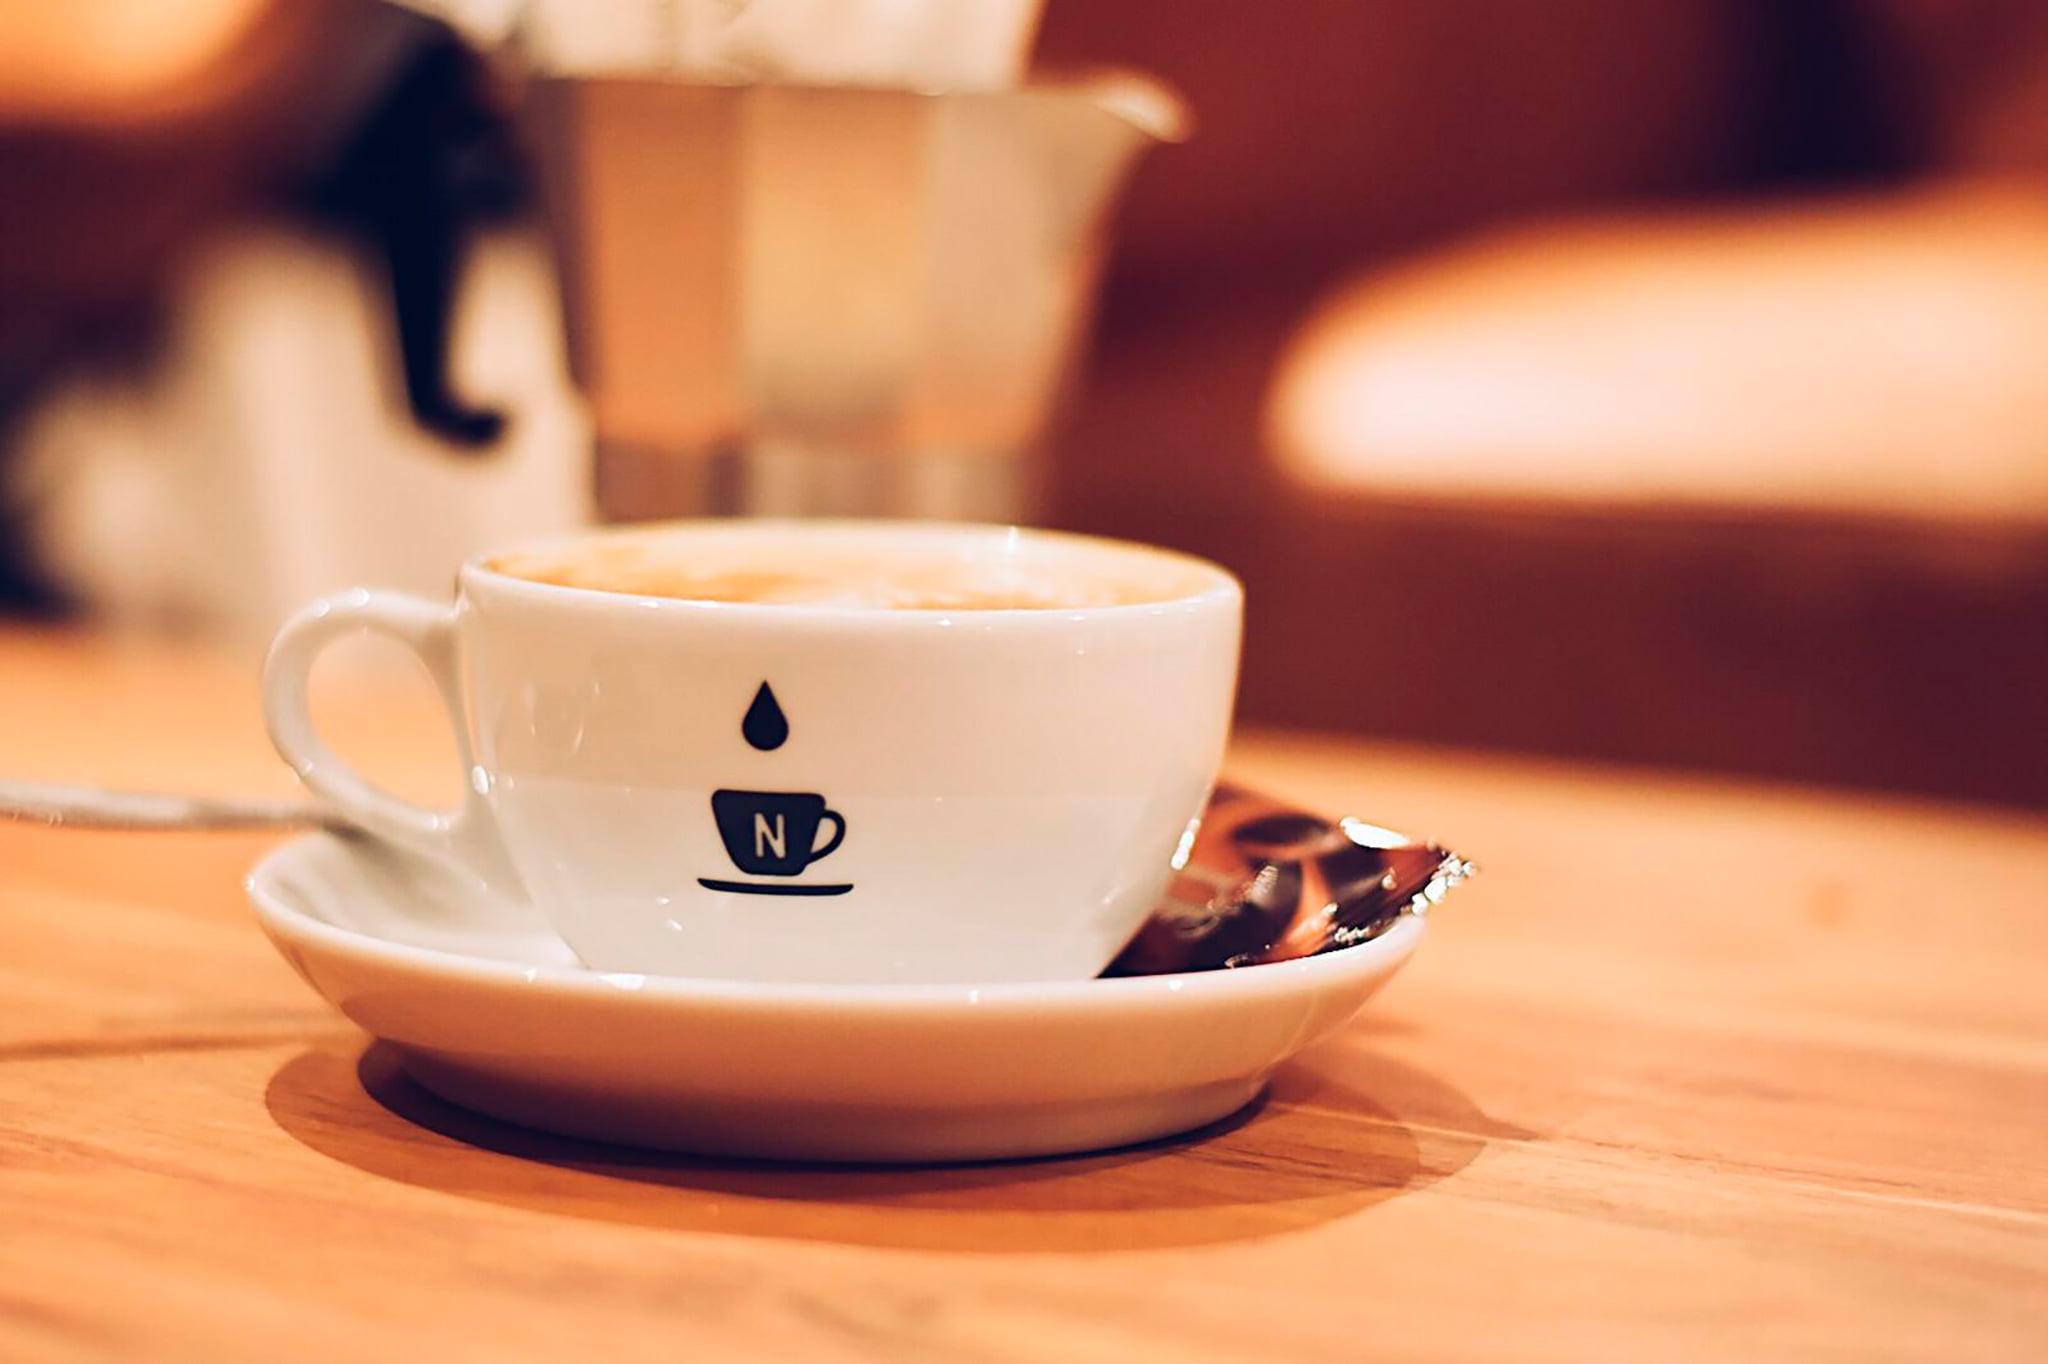 El mejor café de Jávea – Nostro Café Costa